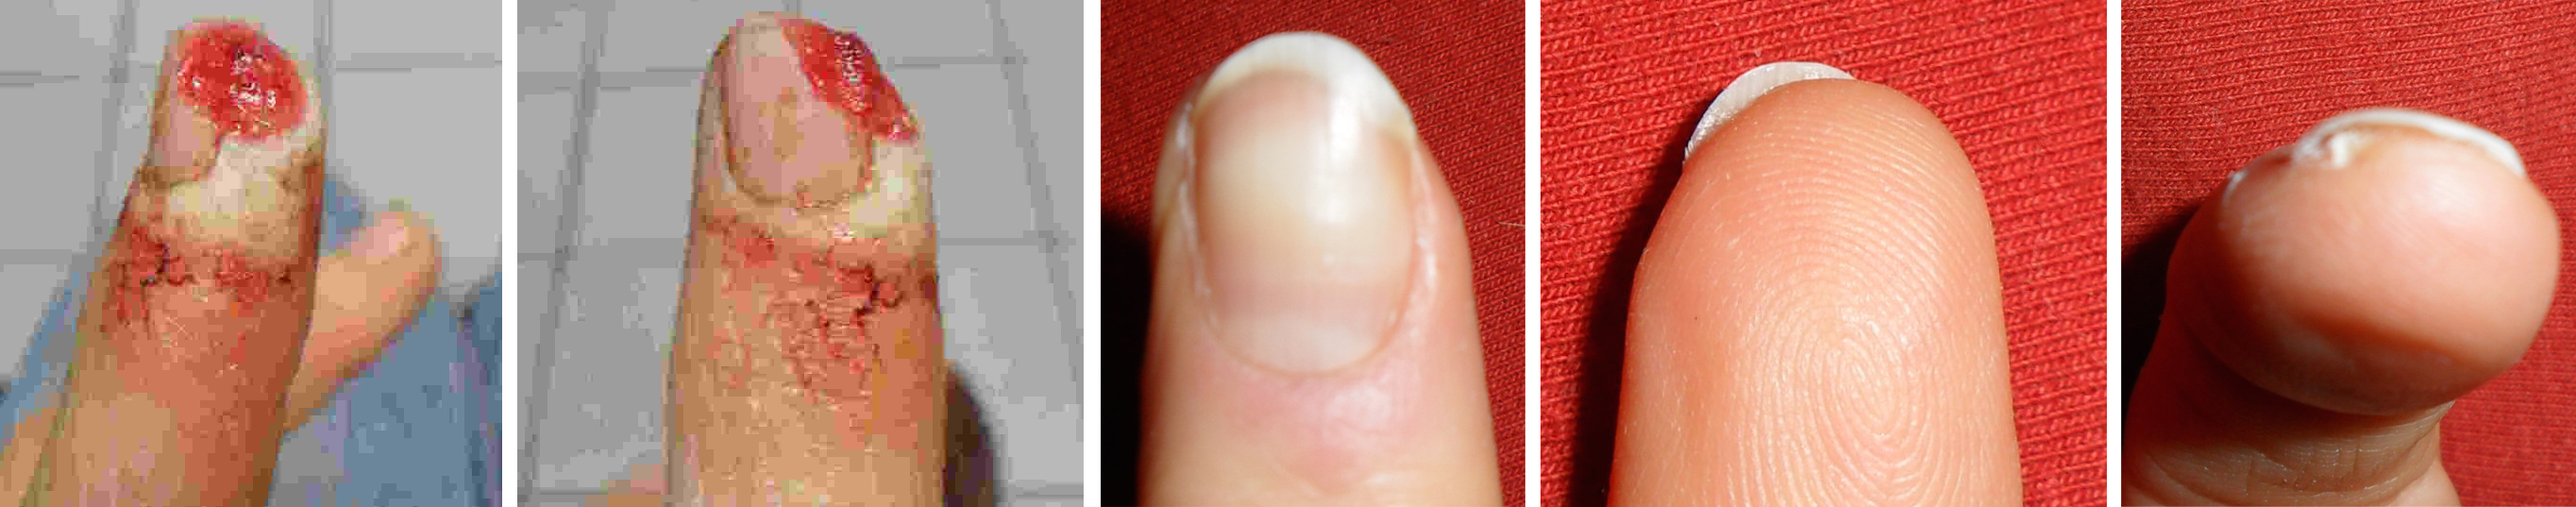 Finger_Brigitte_Krause